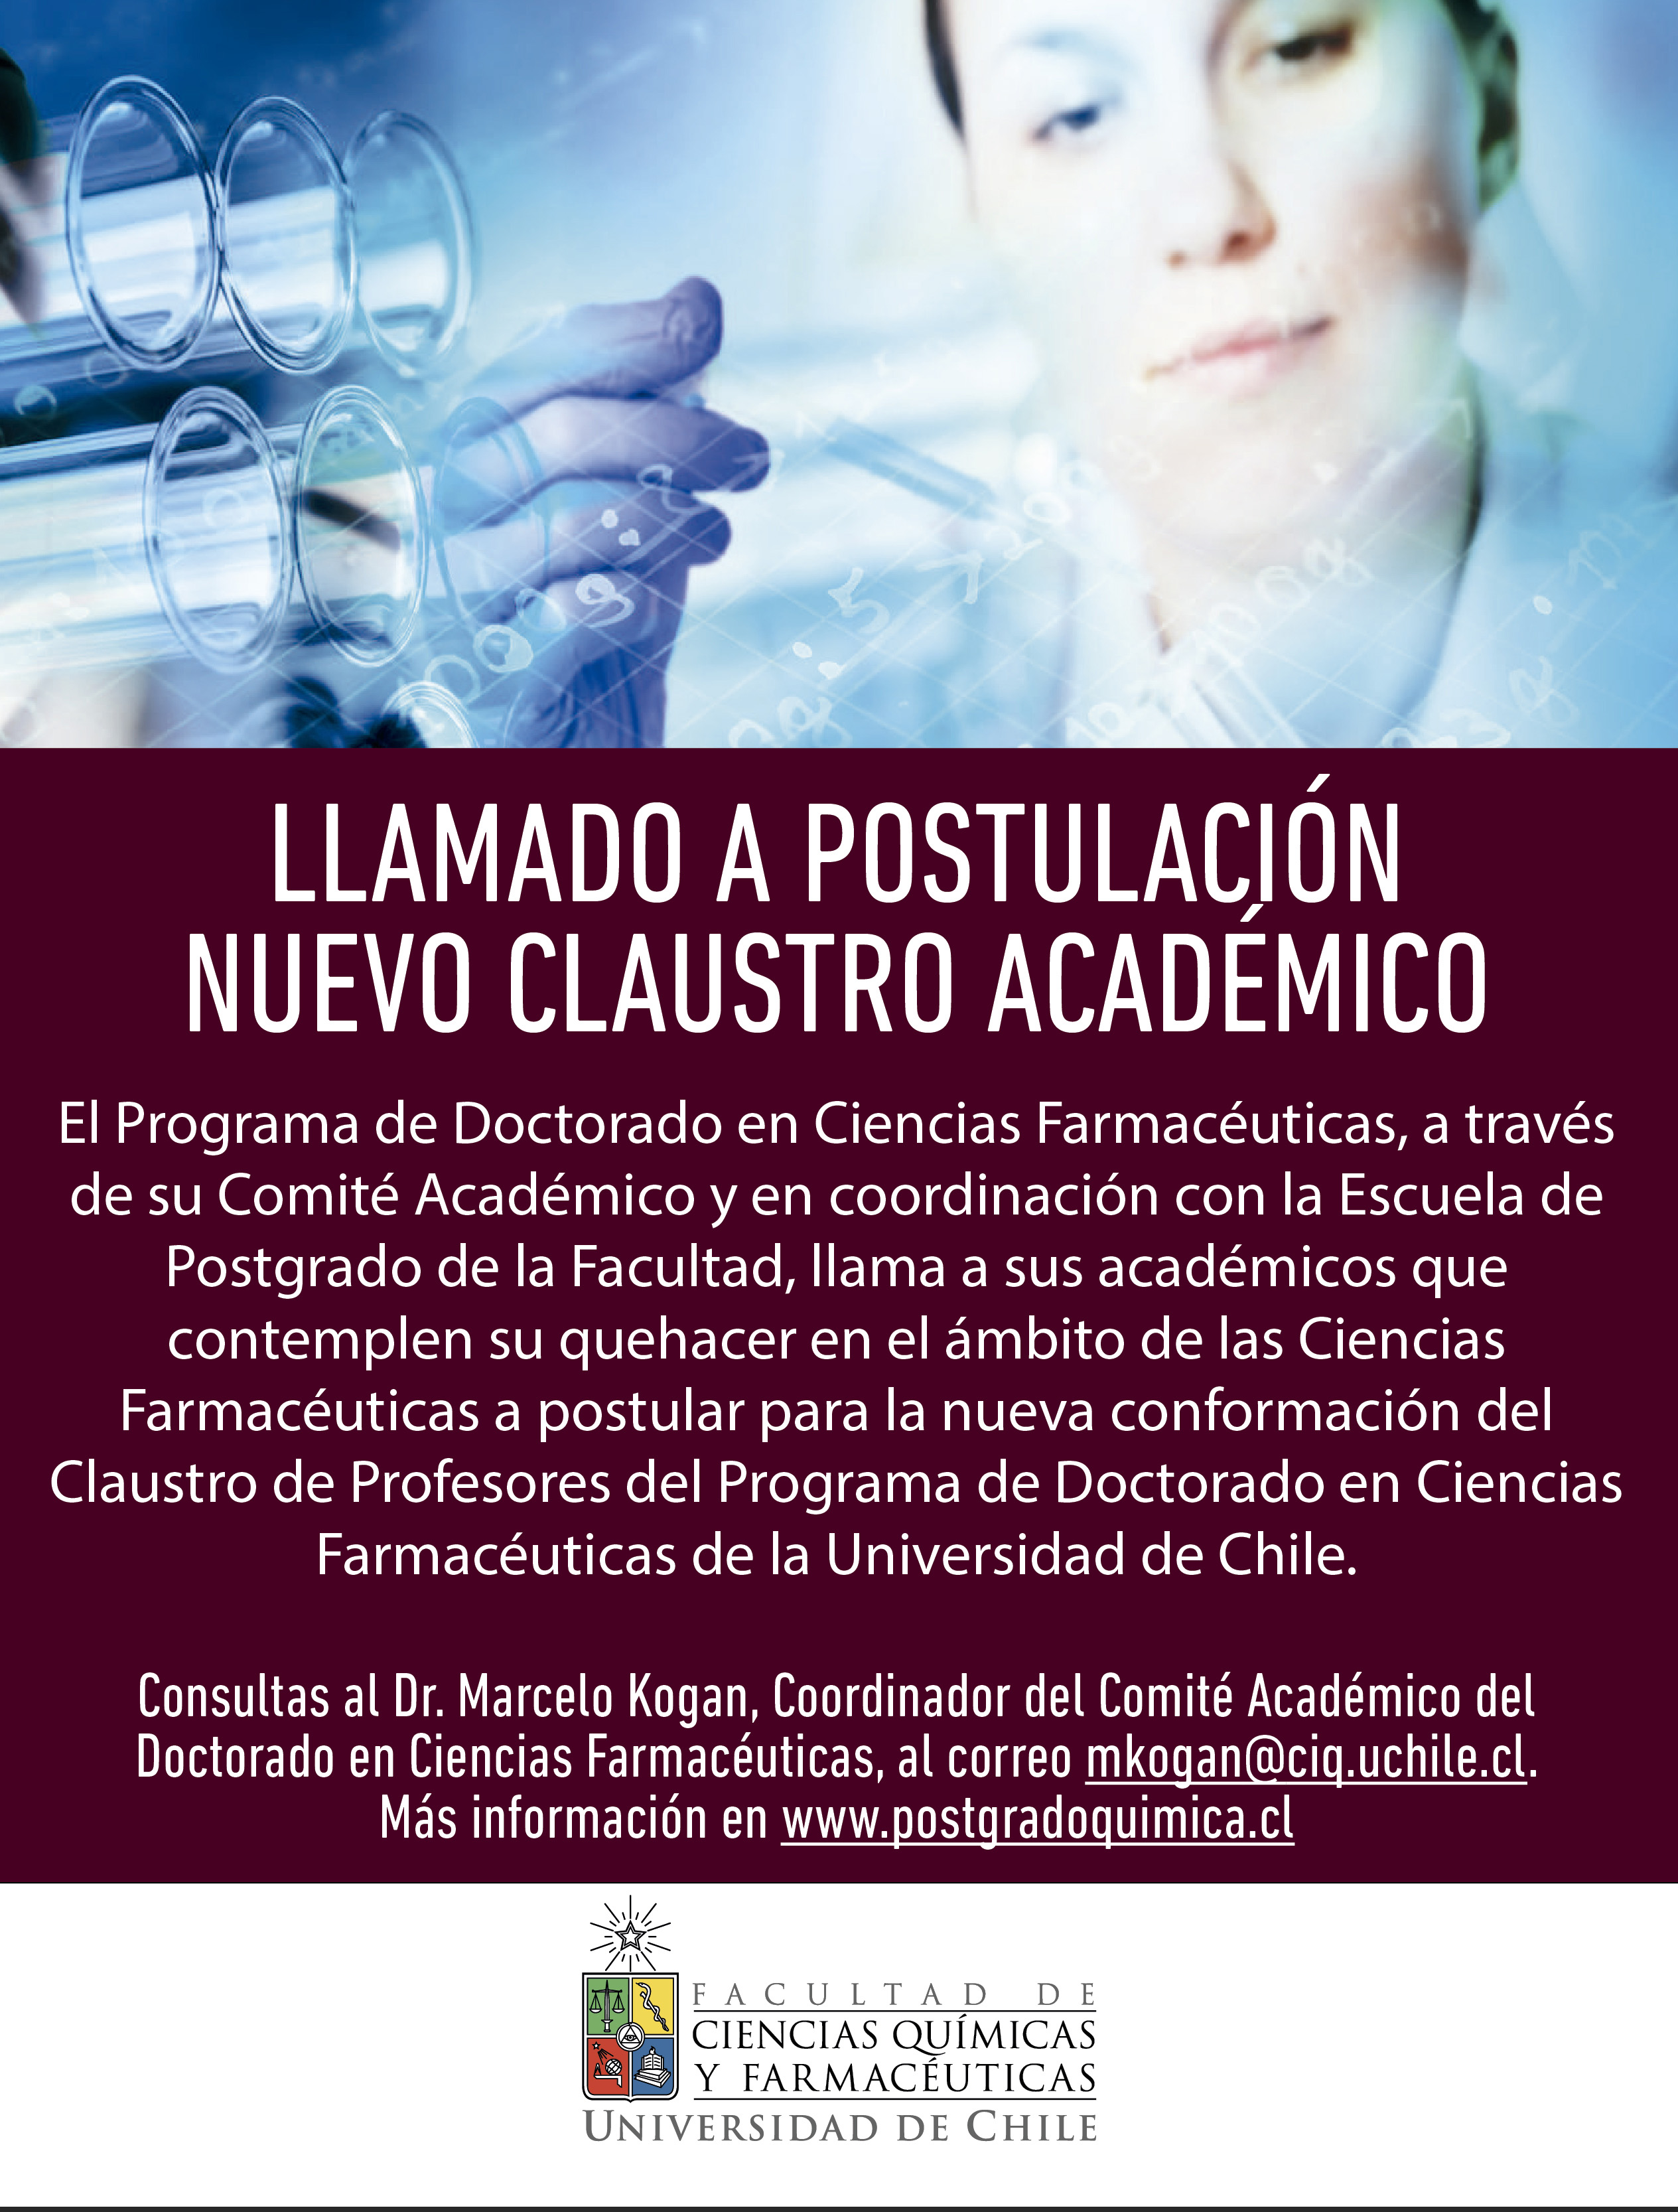 Renovación Claustro Académico Doc. Cs Farmacéuticas